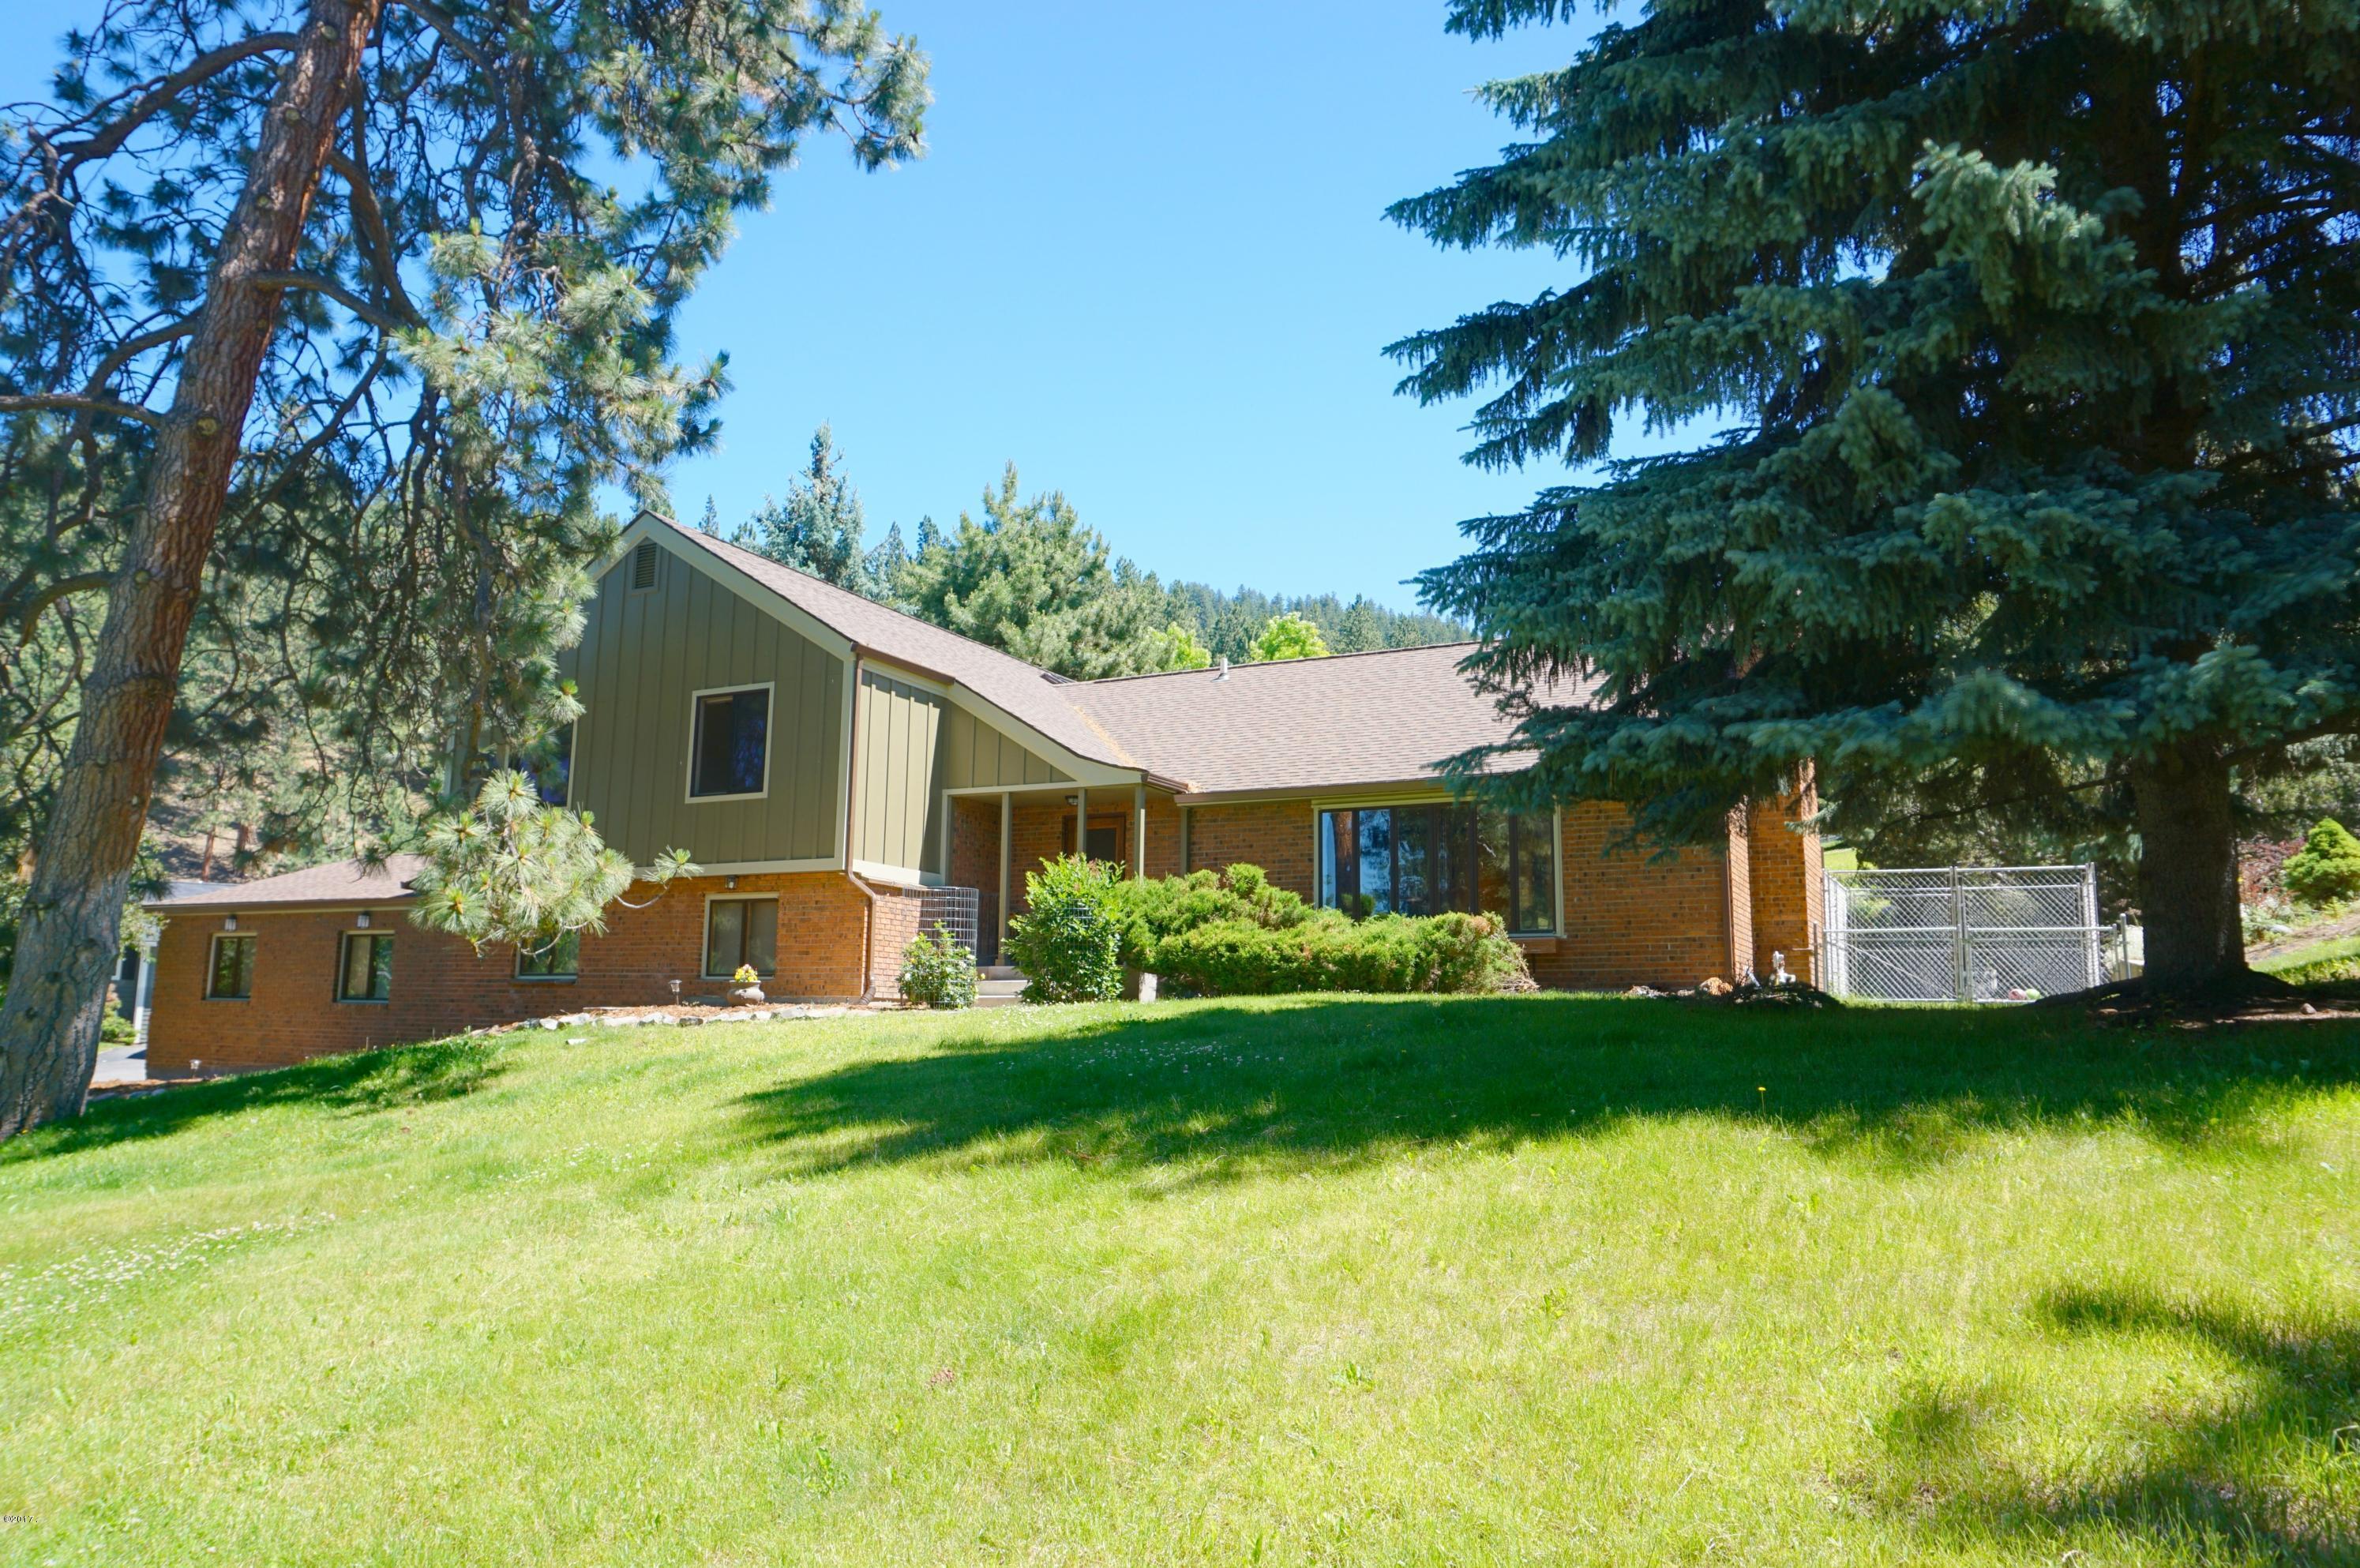 Additional photo for property listing at 6 Elk Ridge Court 6 Elk Ridge Court Missoula, Montana 59802 United States